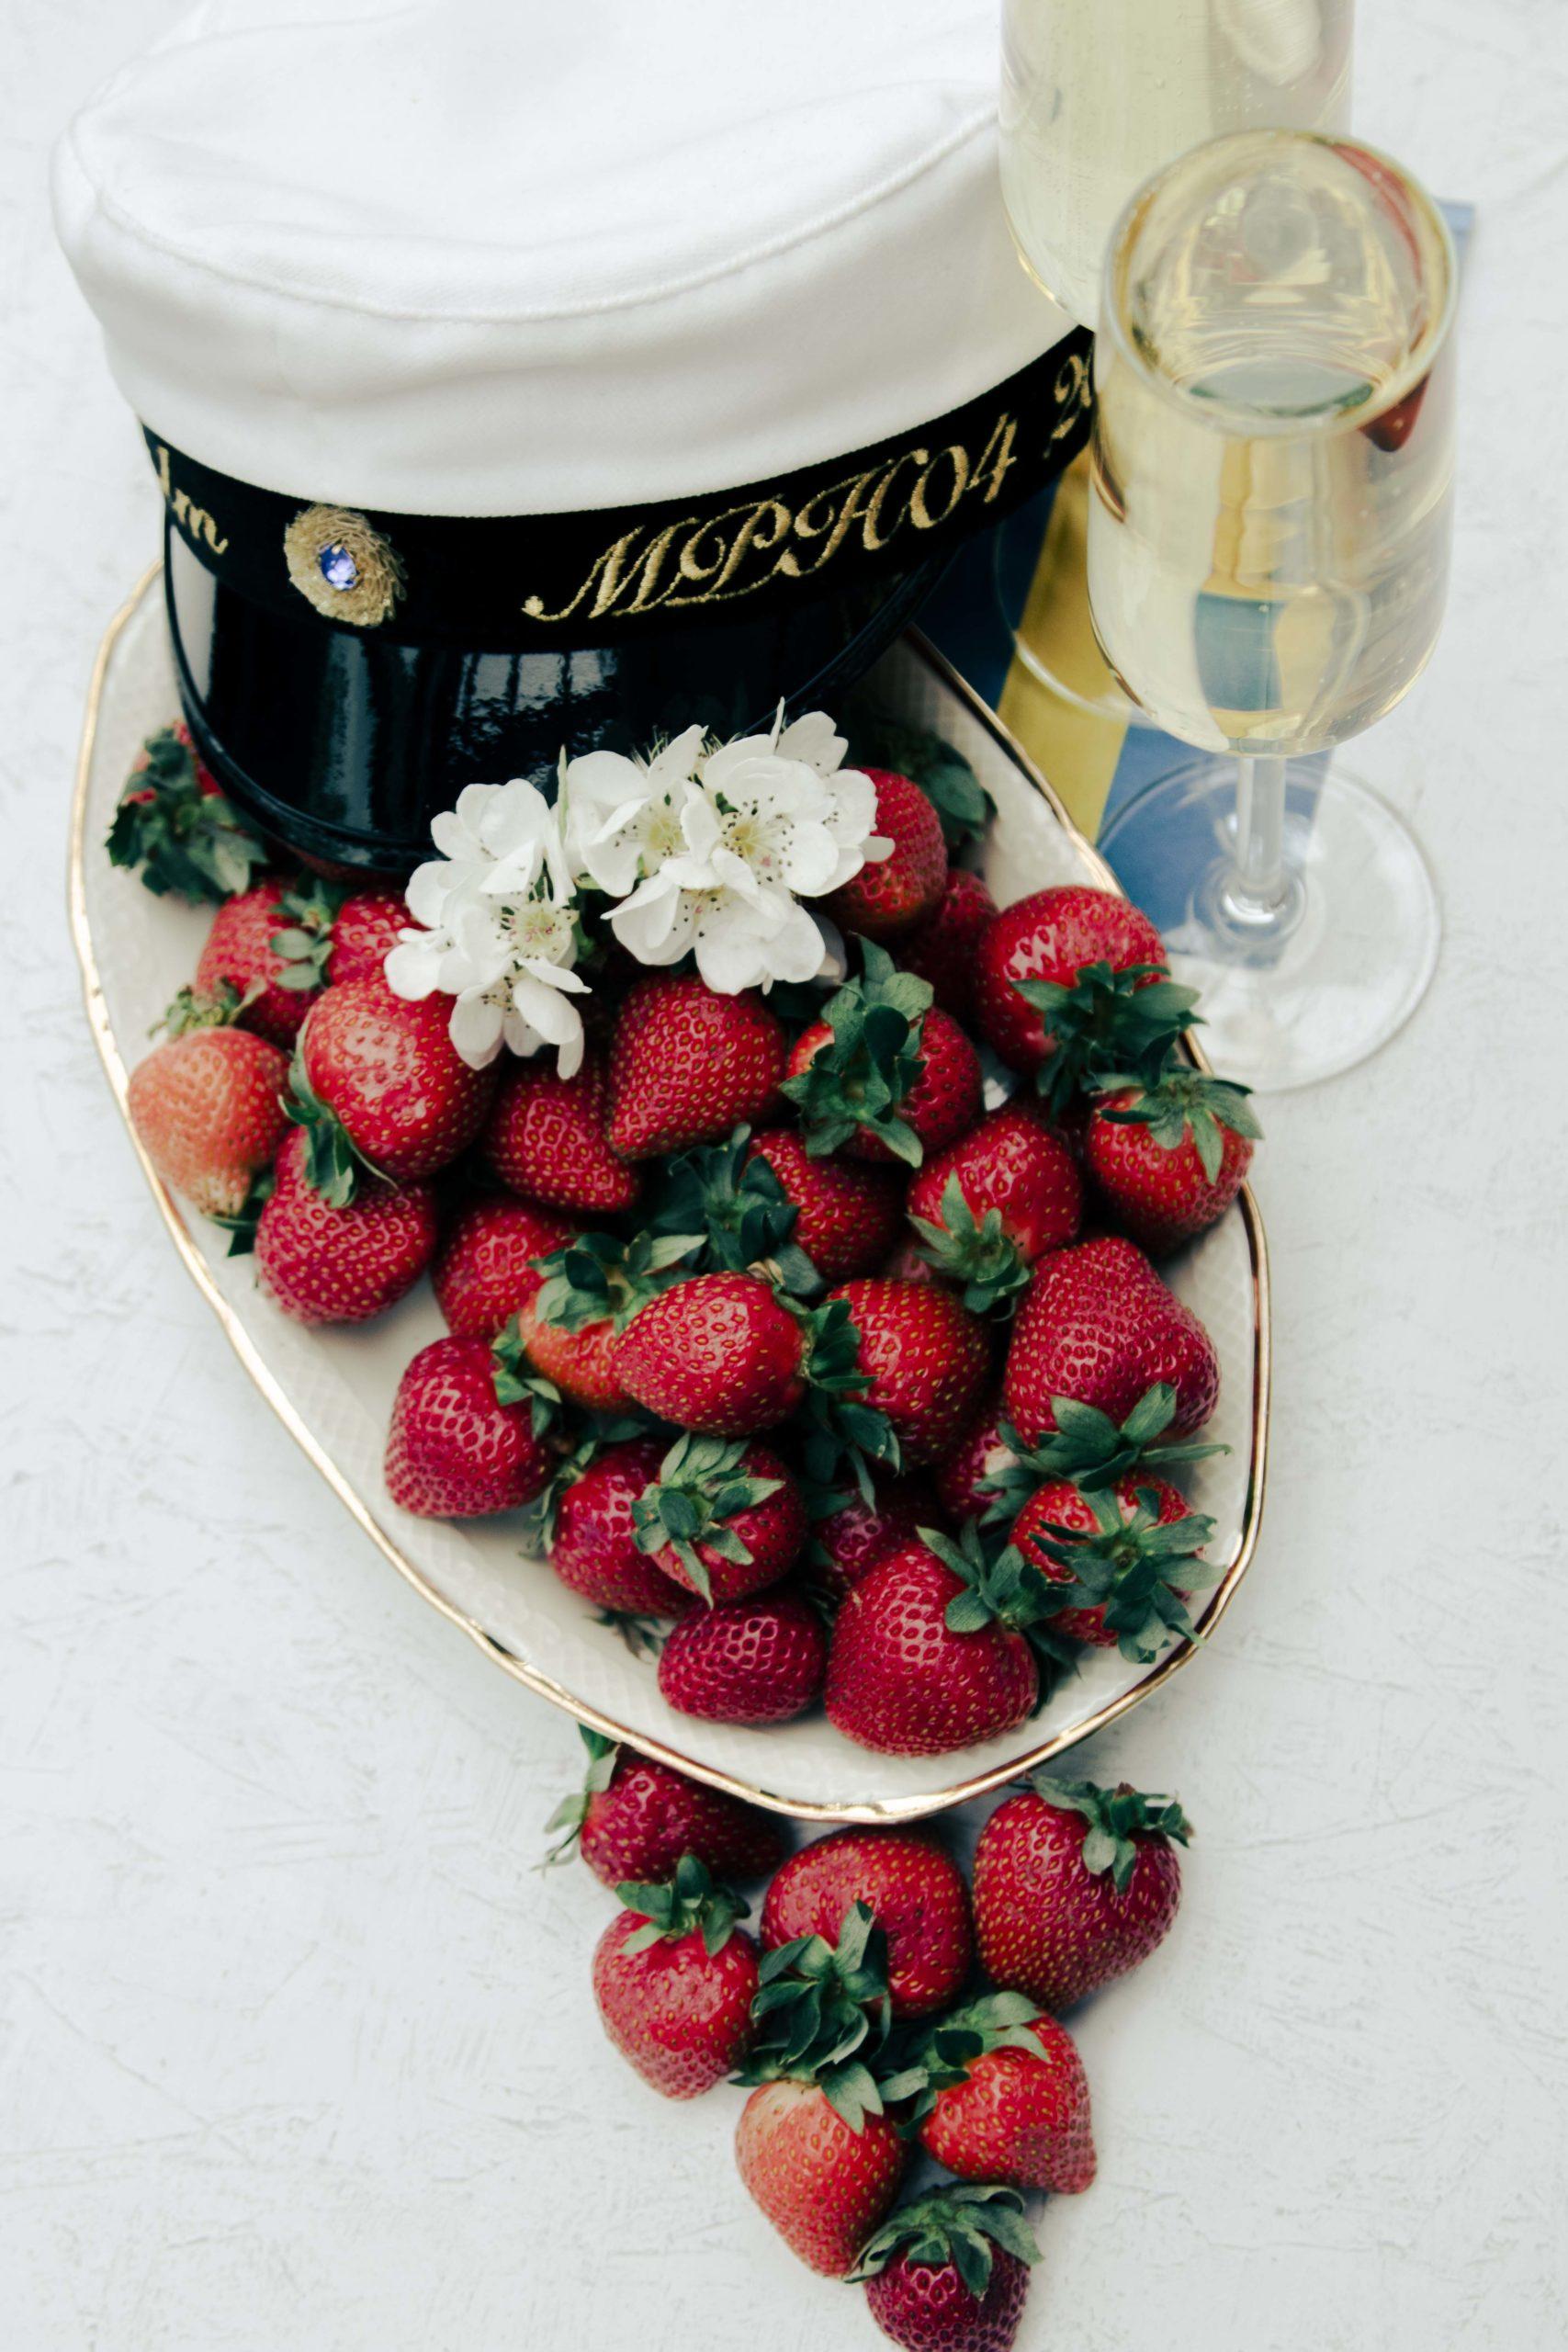 studenthat, bubbles, champanjeglass, strawberrys, celebrate, swedish flag, retro